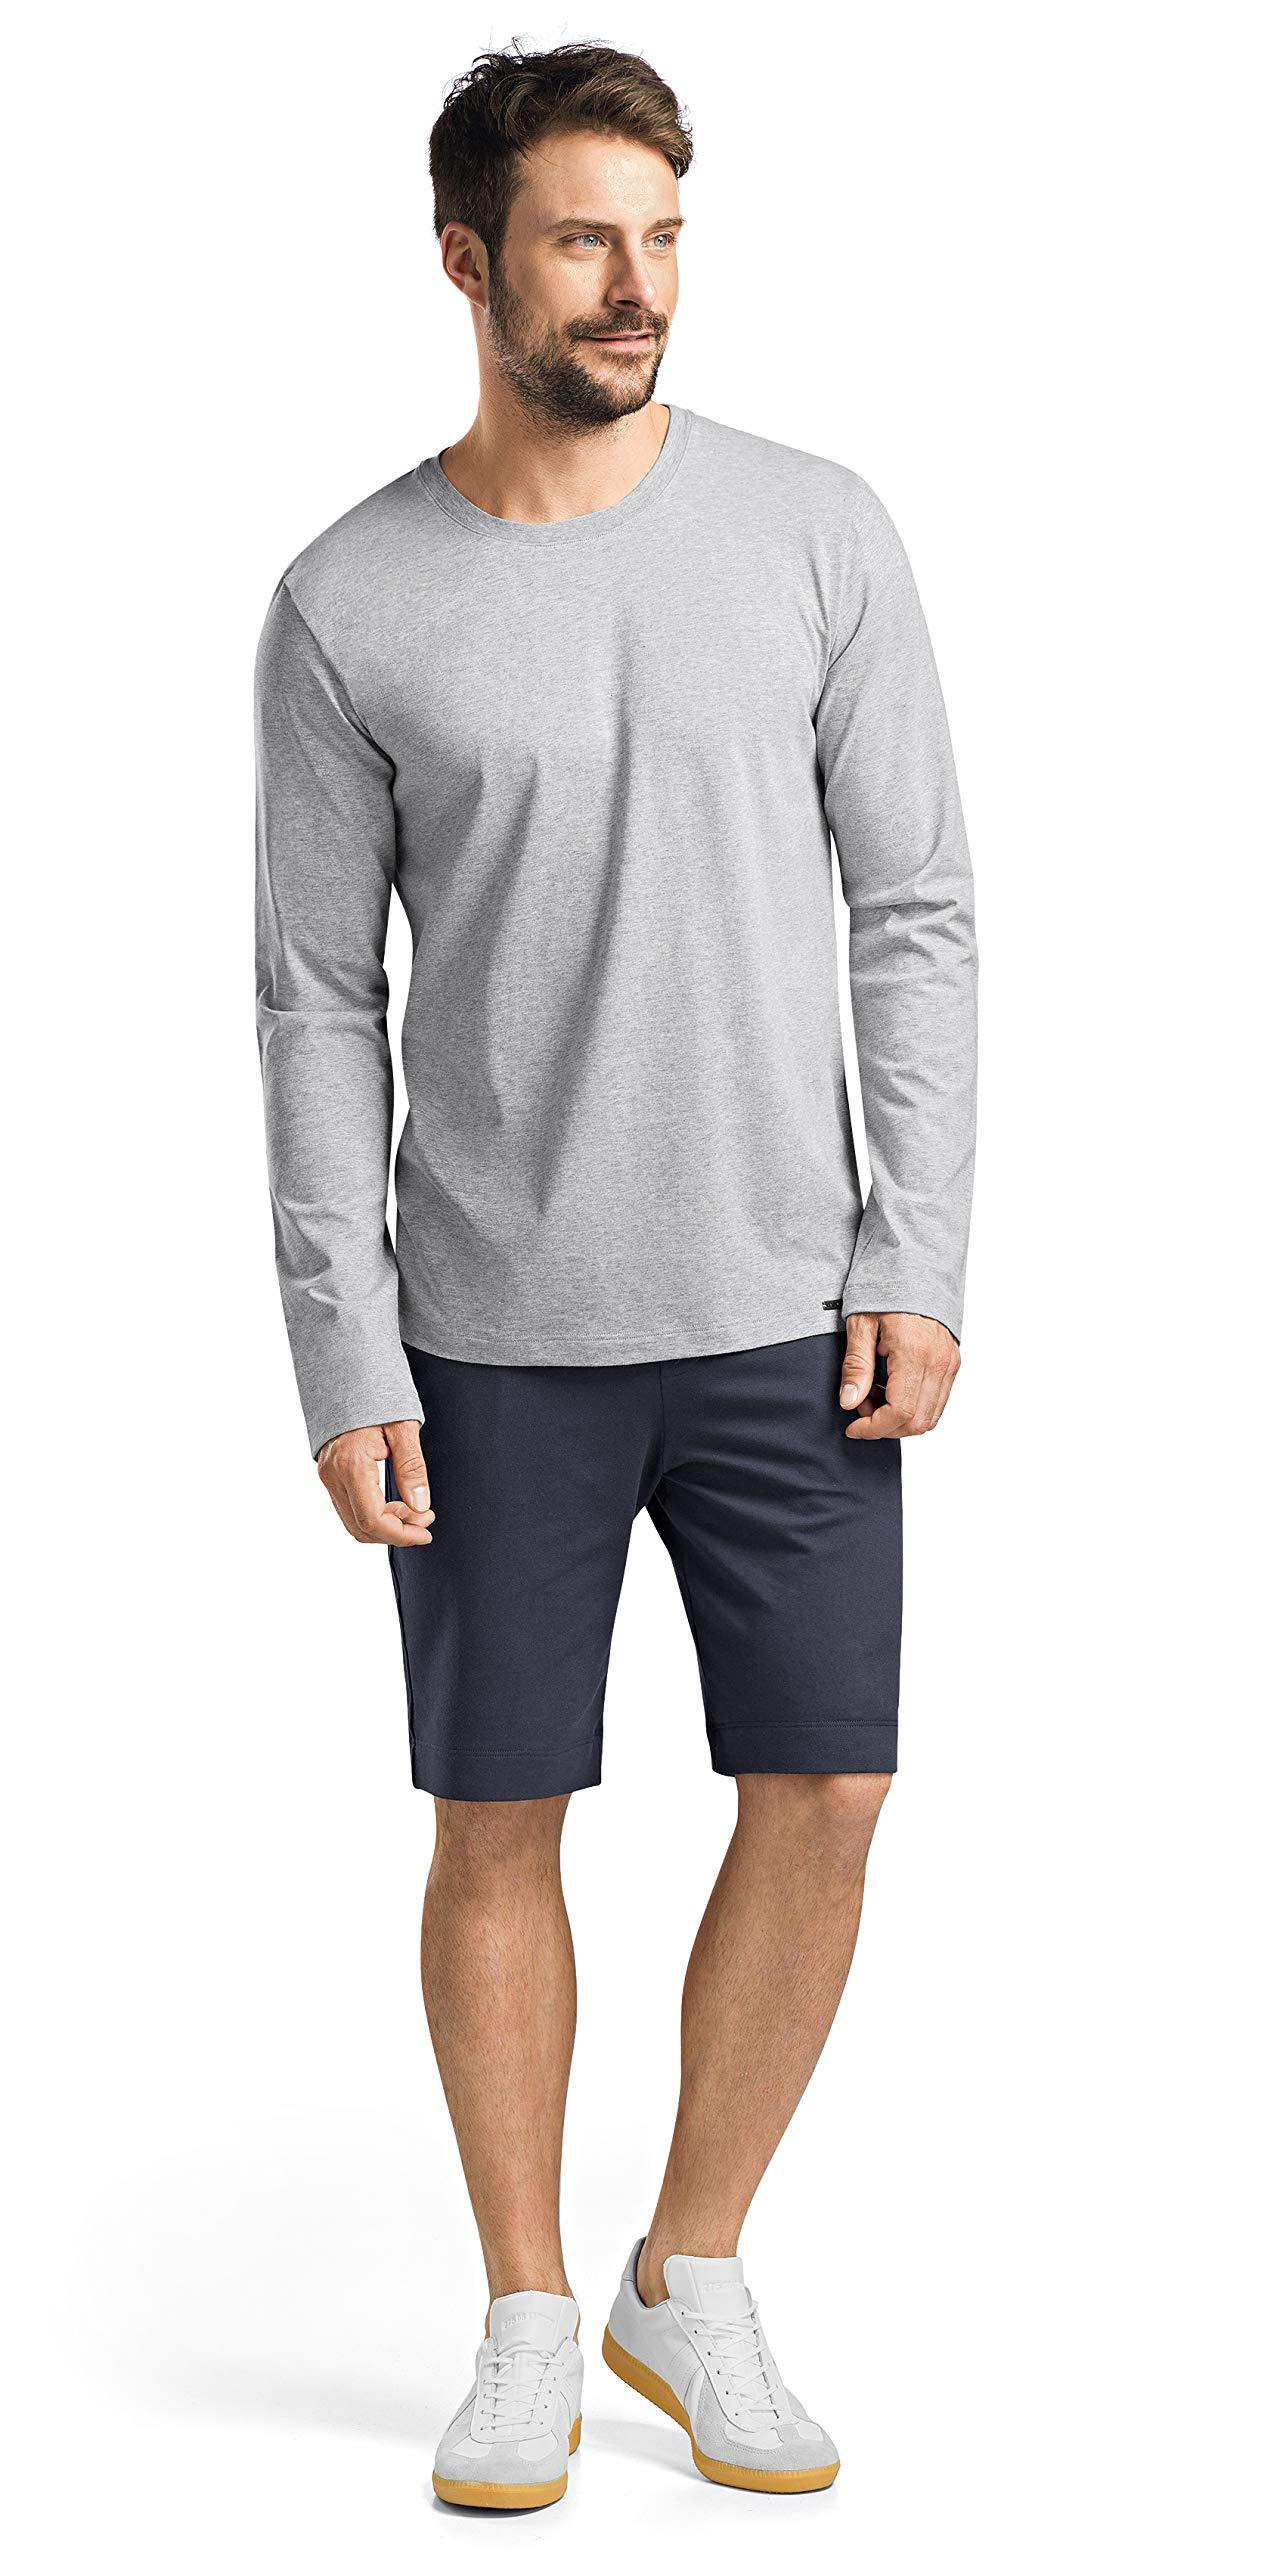 HANRO Men's Living Long Sleeve Shirt, Grey Melange, Large